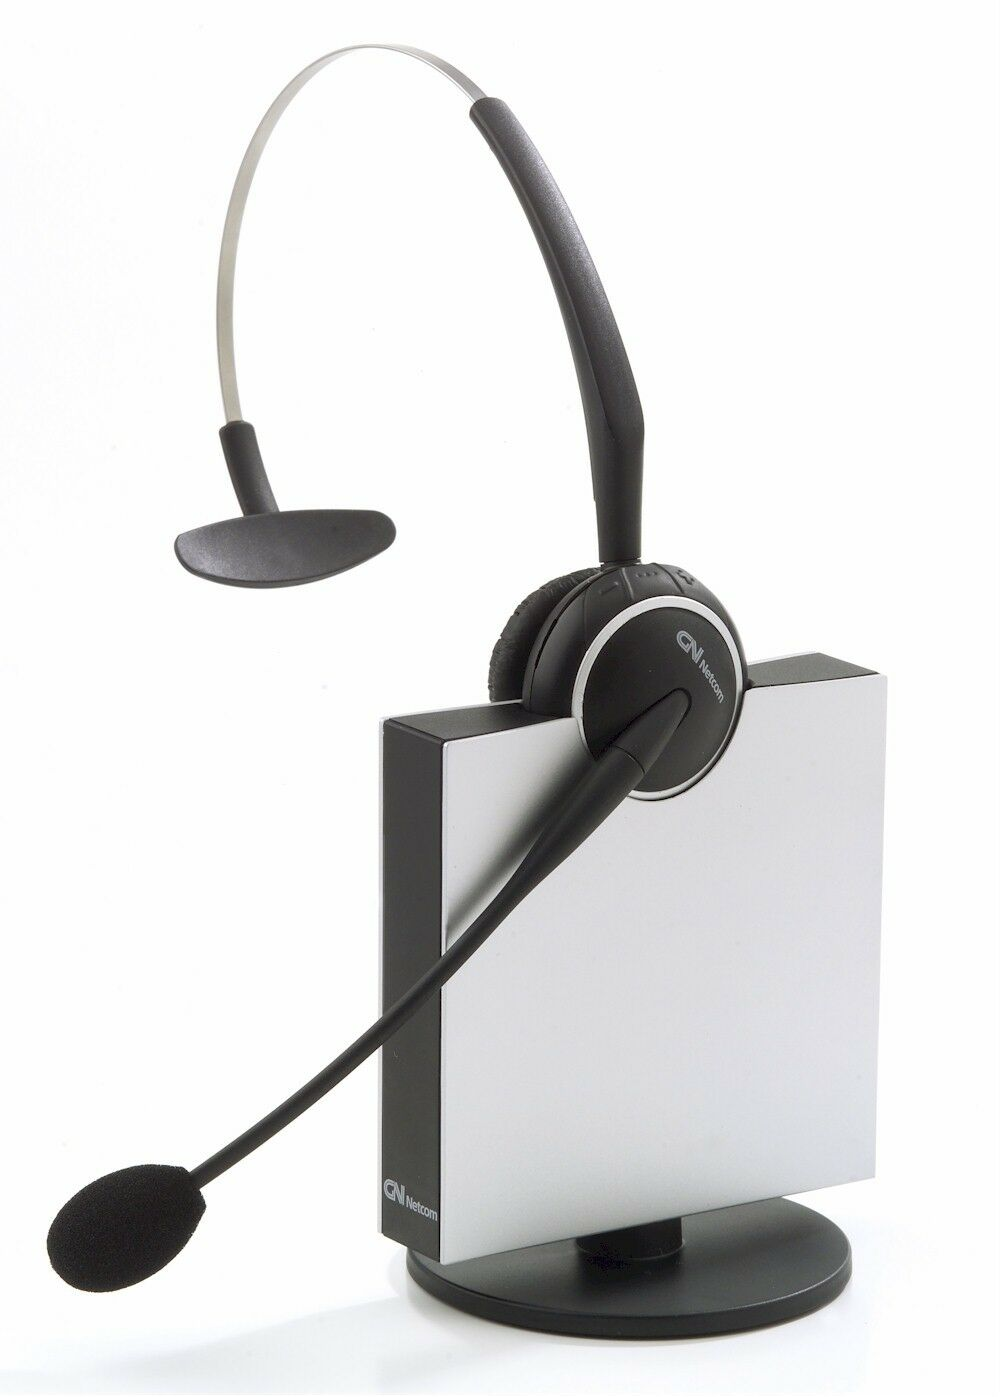 Jabra GN9120 Flex Boom Noise Canceling Microphone 1.8GHz Wireless Phone Headset